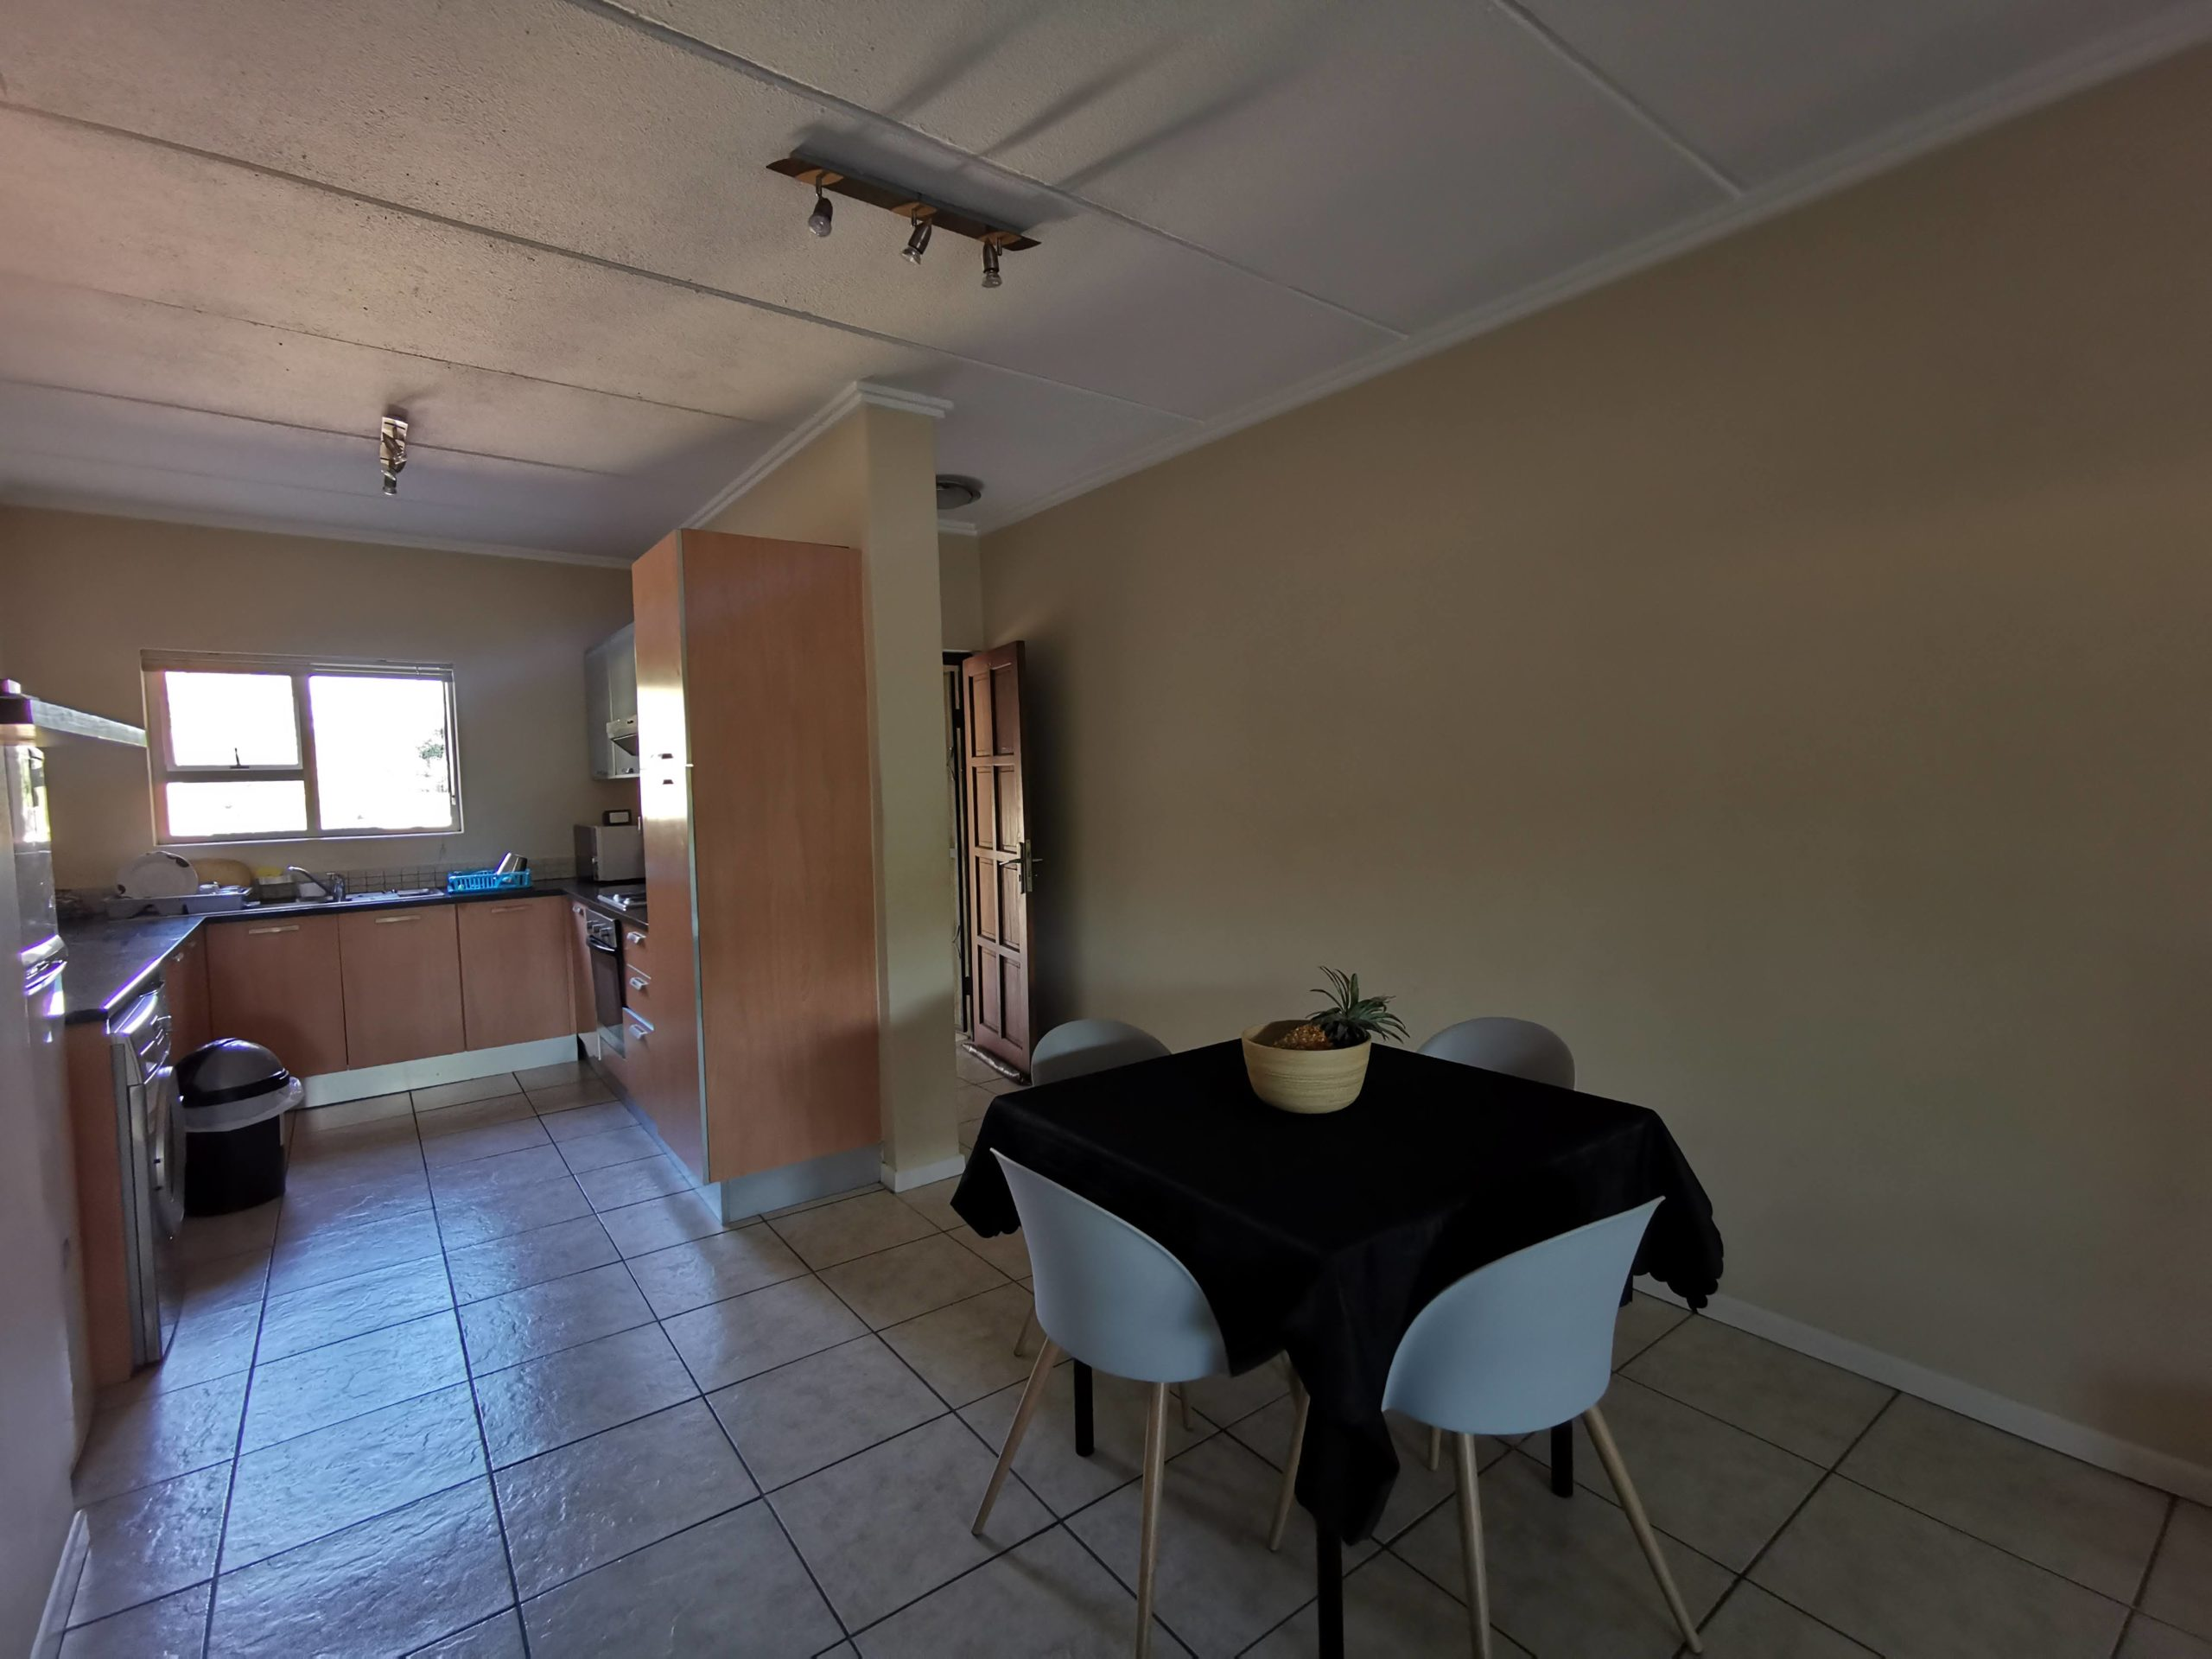 11 The Corners – 2 Bedroom, 2 Bathroom Apartment to rent